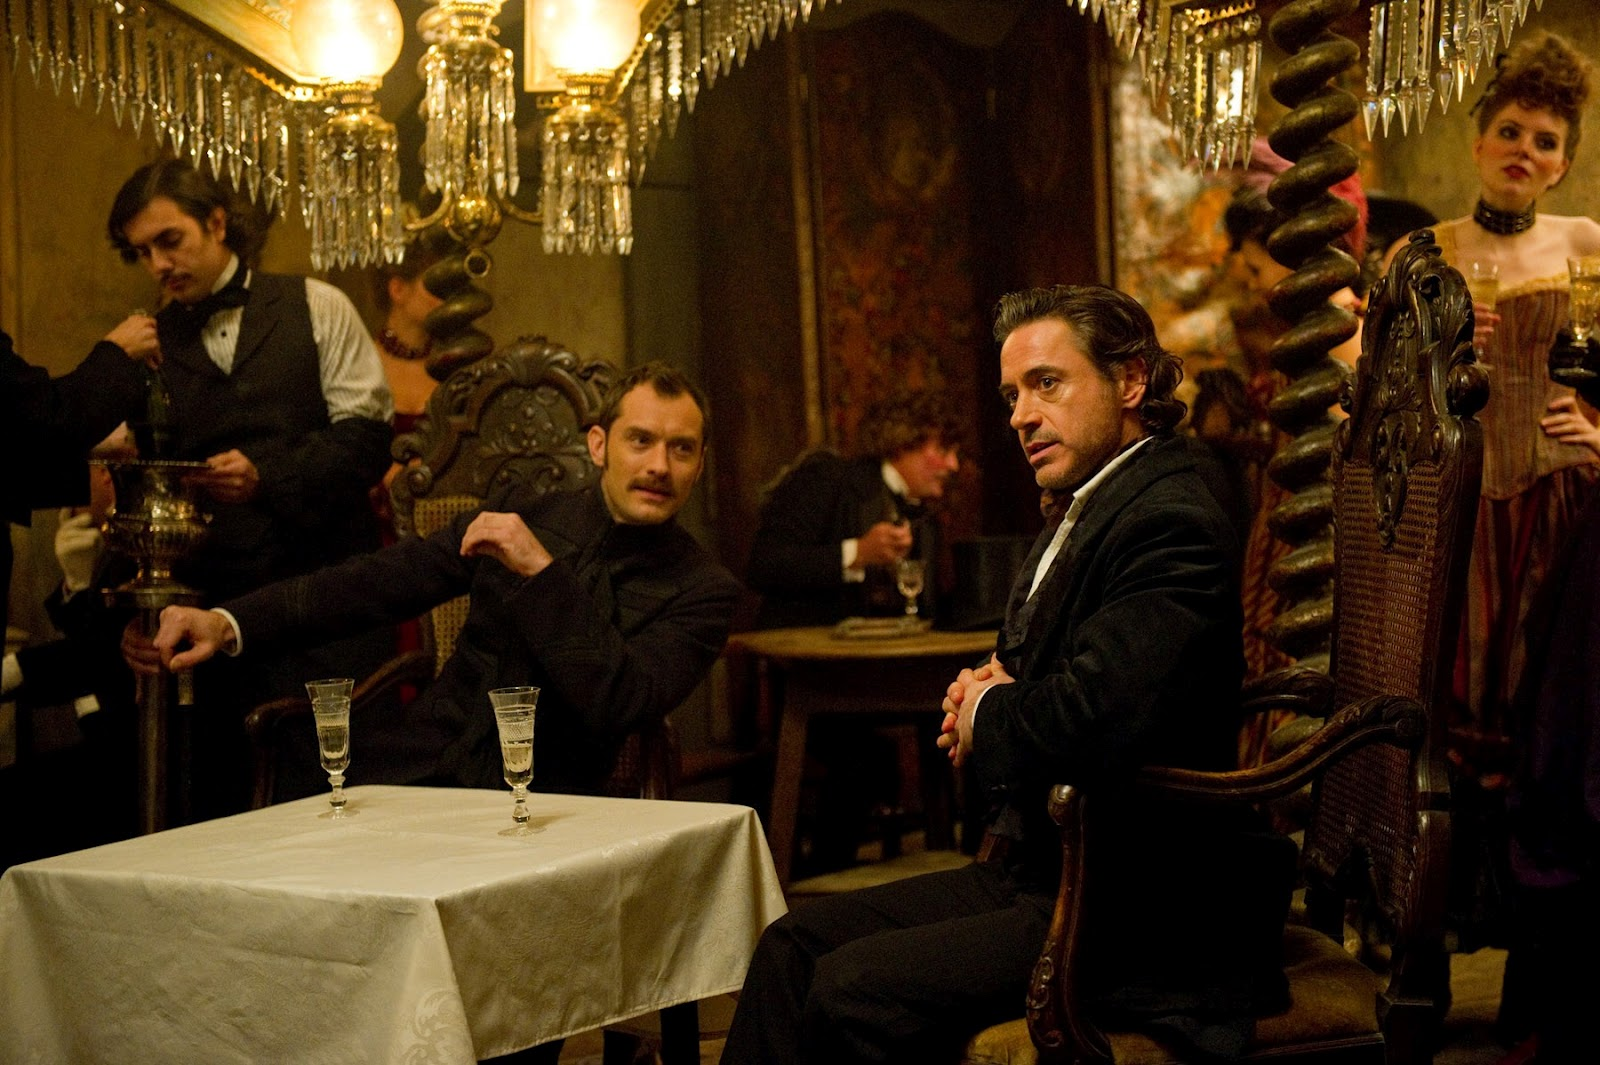 http://1.bp.blogspot.com/-IyEimshuqQY/T_F8amF3I-I/AAAAAAAABwo/F9dcpPacM1A/s1600/Sherlock-Holmes-A-Game-of-Shadows-image-Robert-Downey-Jr-Jude-Law-1.jpg